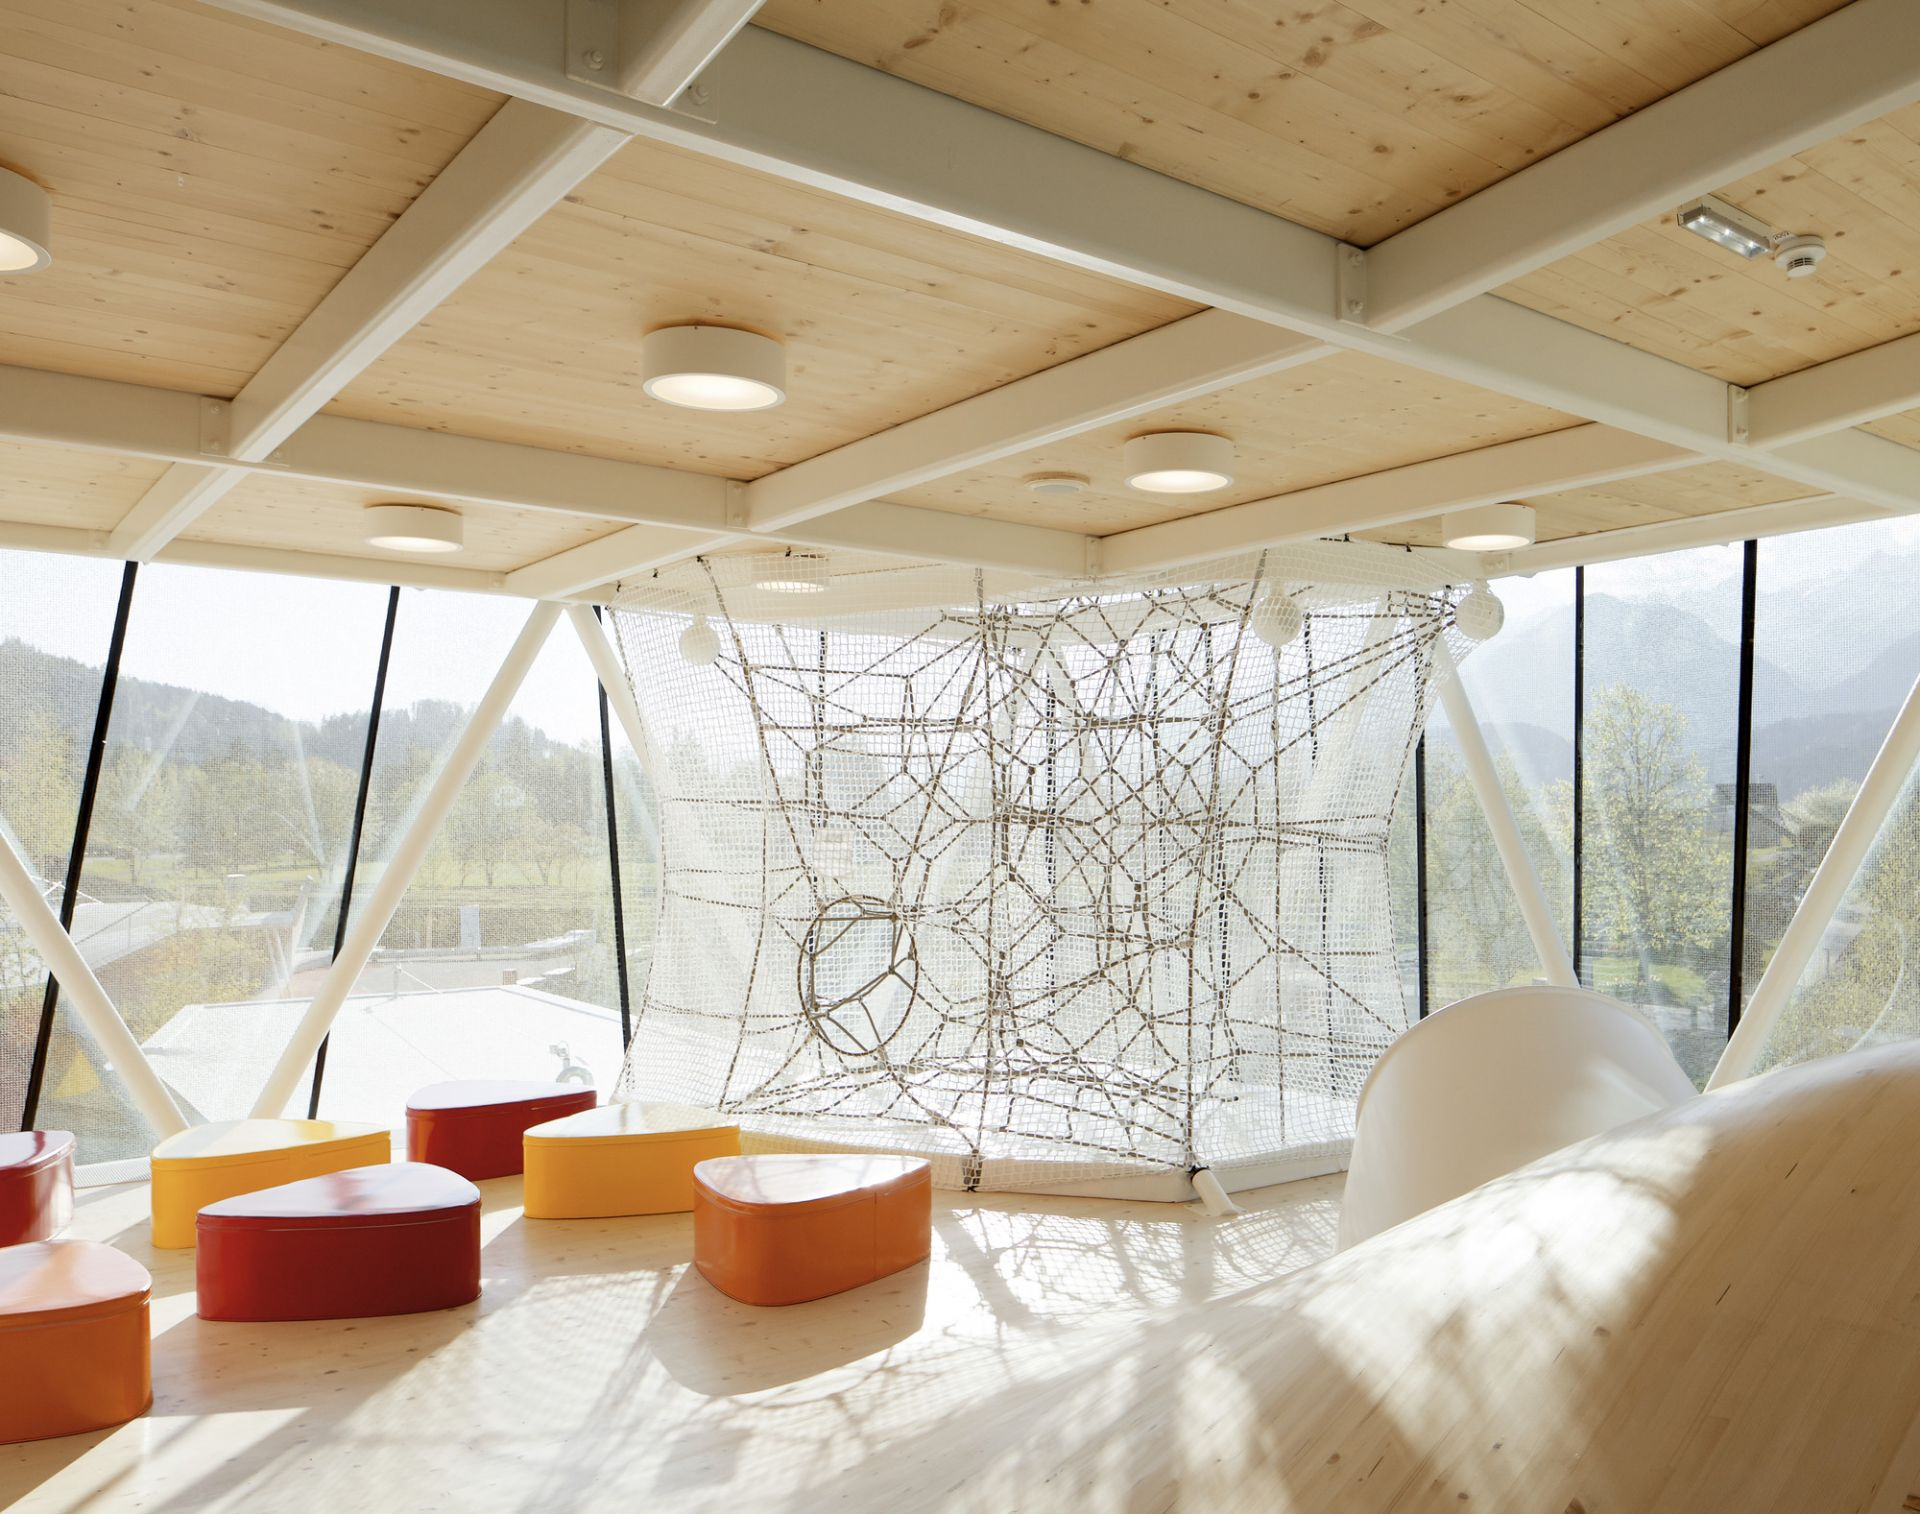 swarovski - Swarovski Interior Design